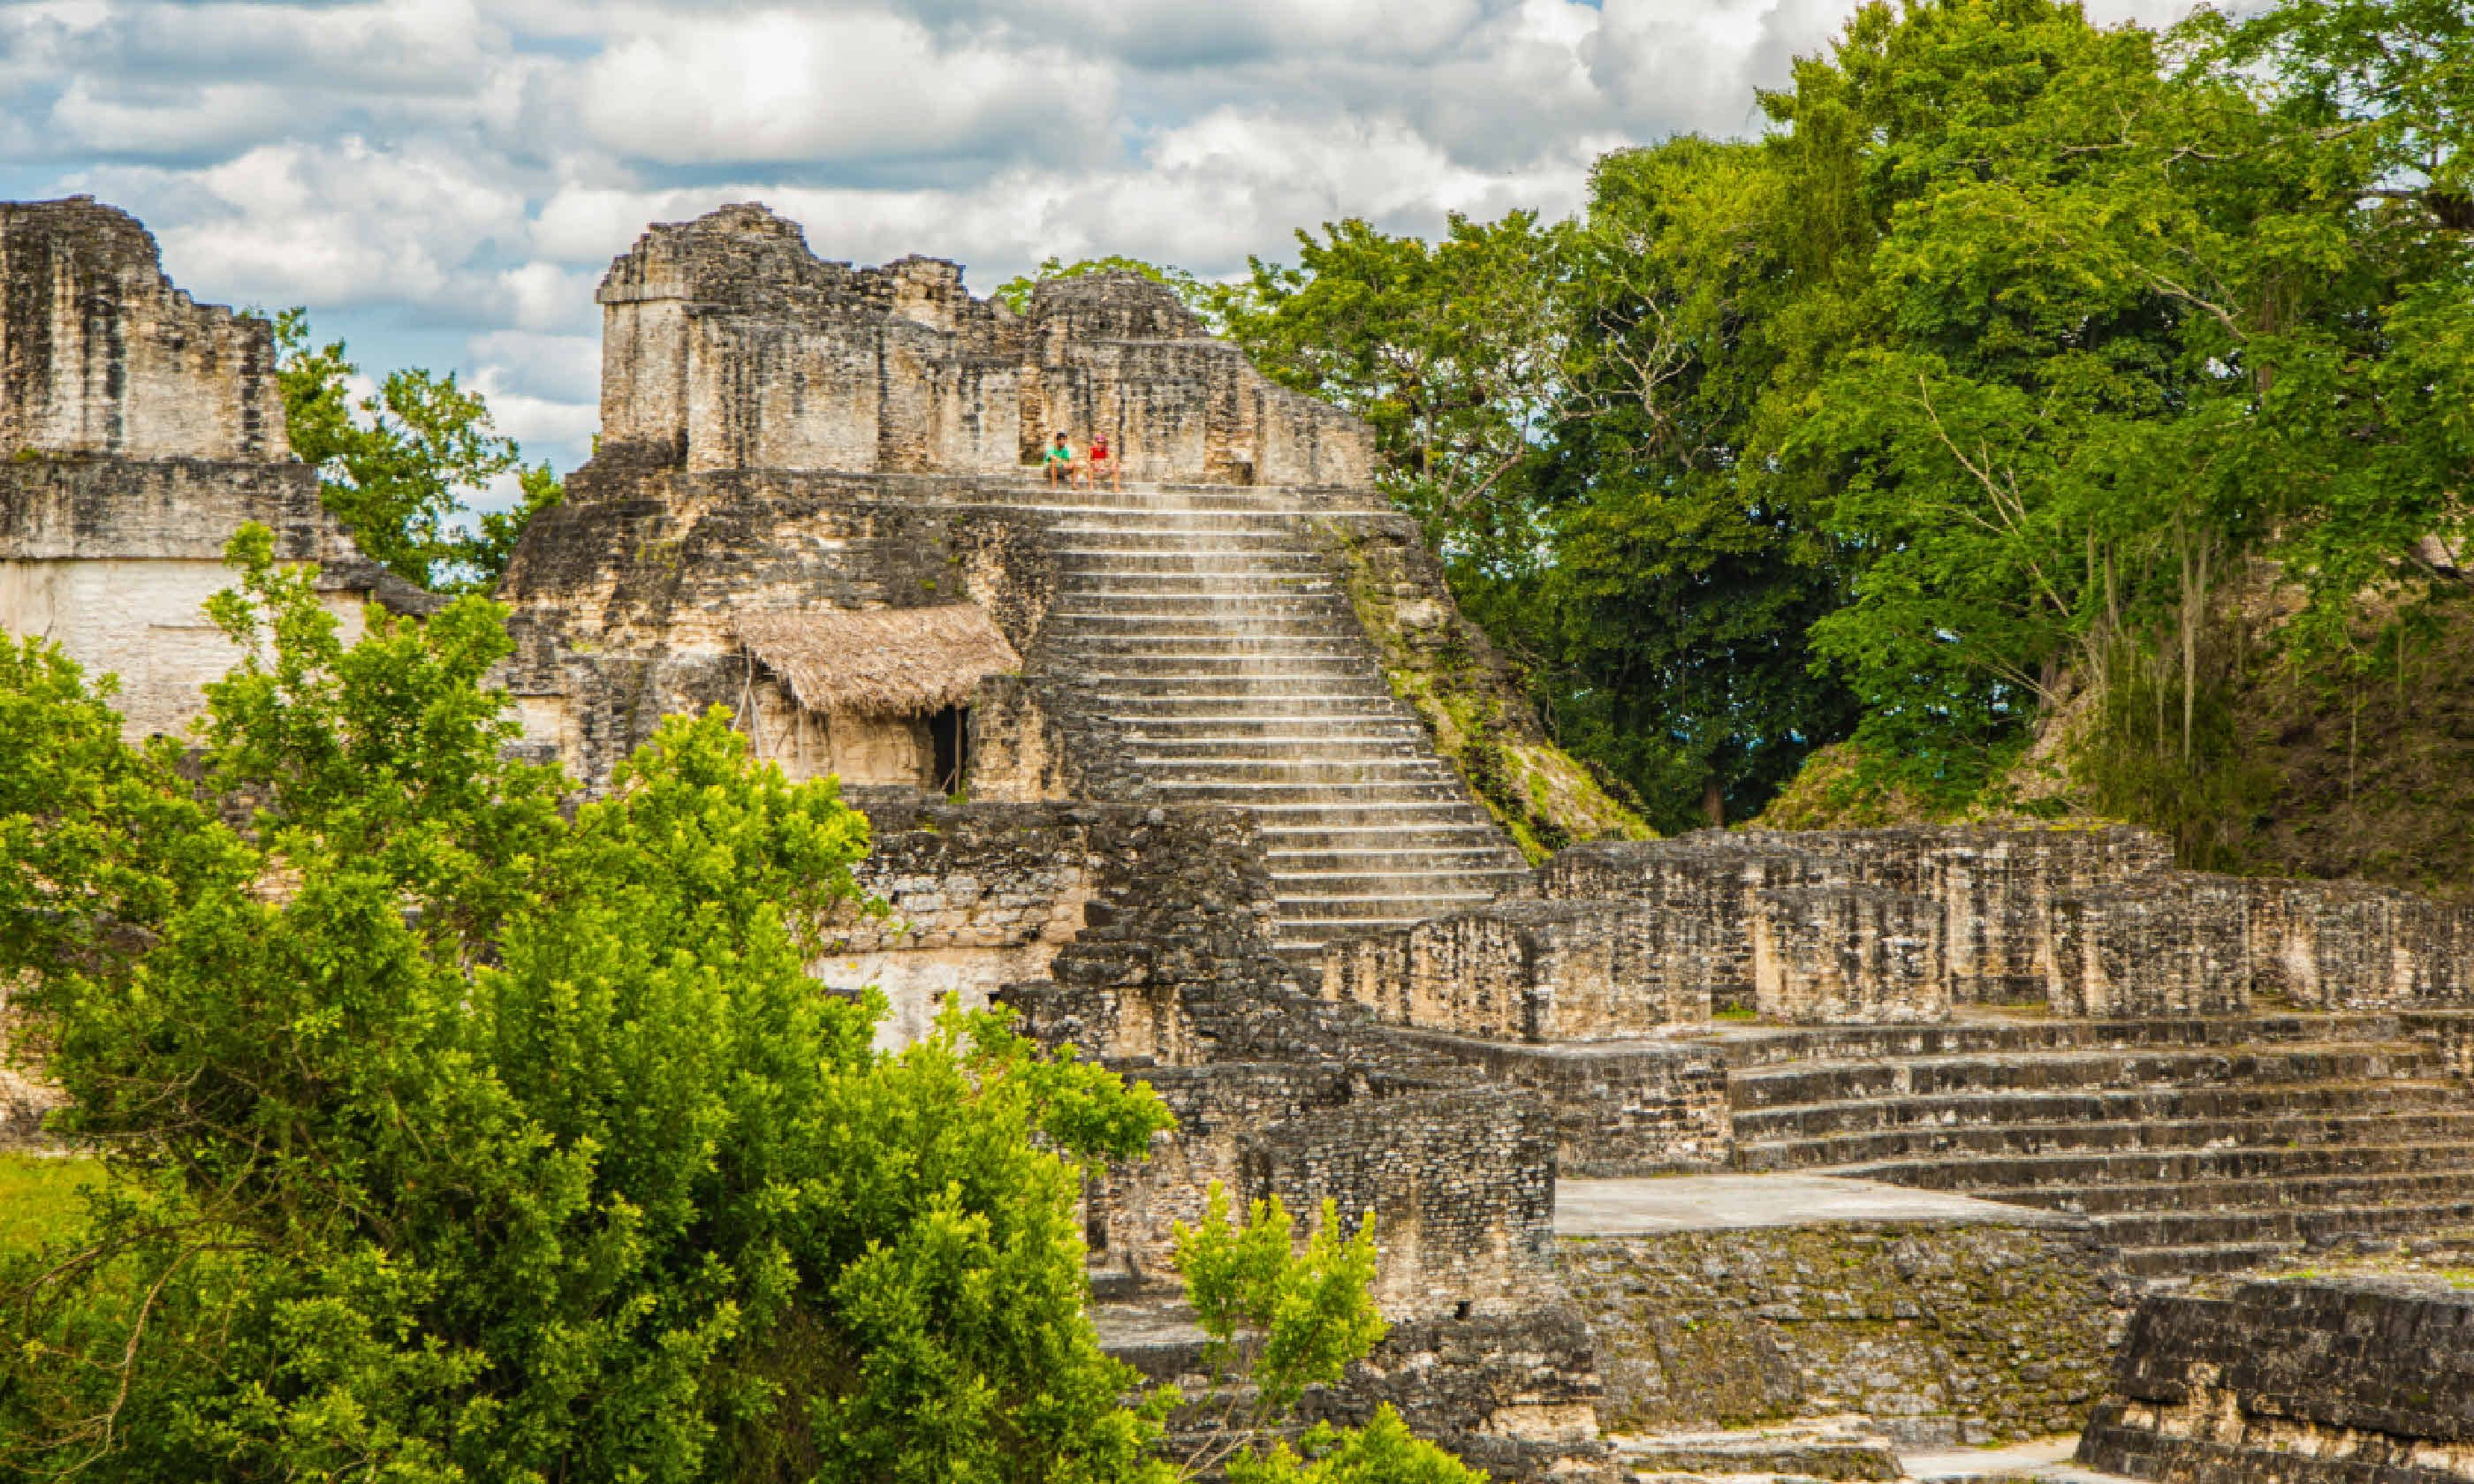 Ancient Mayan pyramid and ruins in Tikal (Shutterstock)